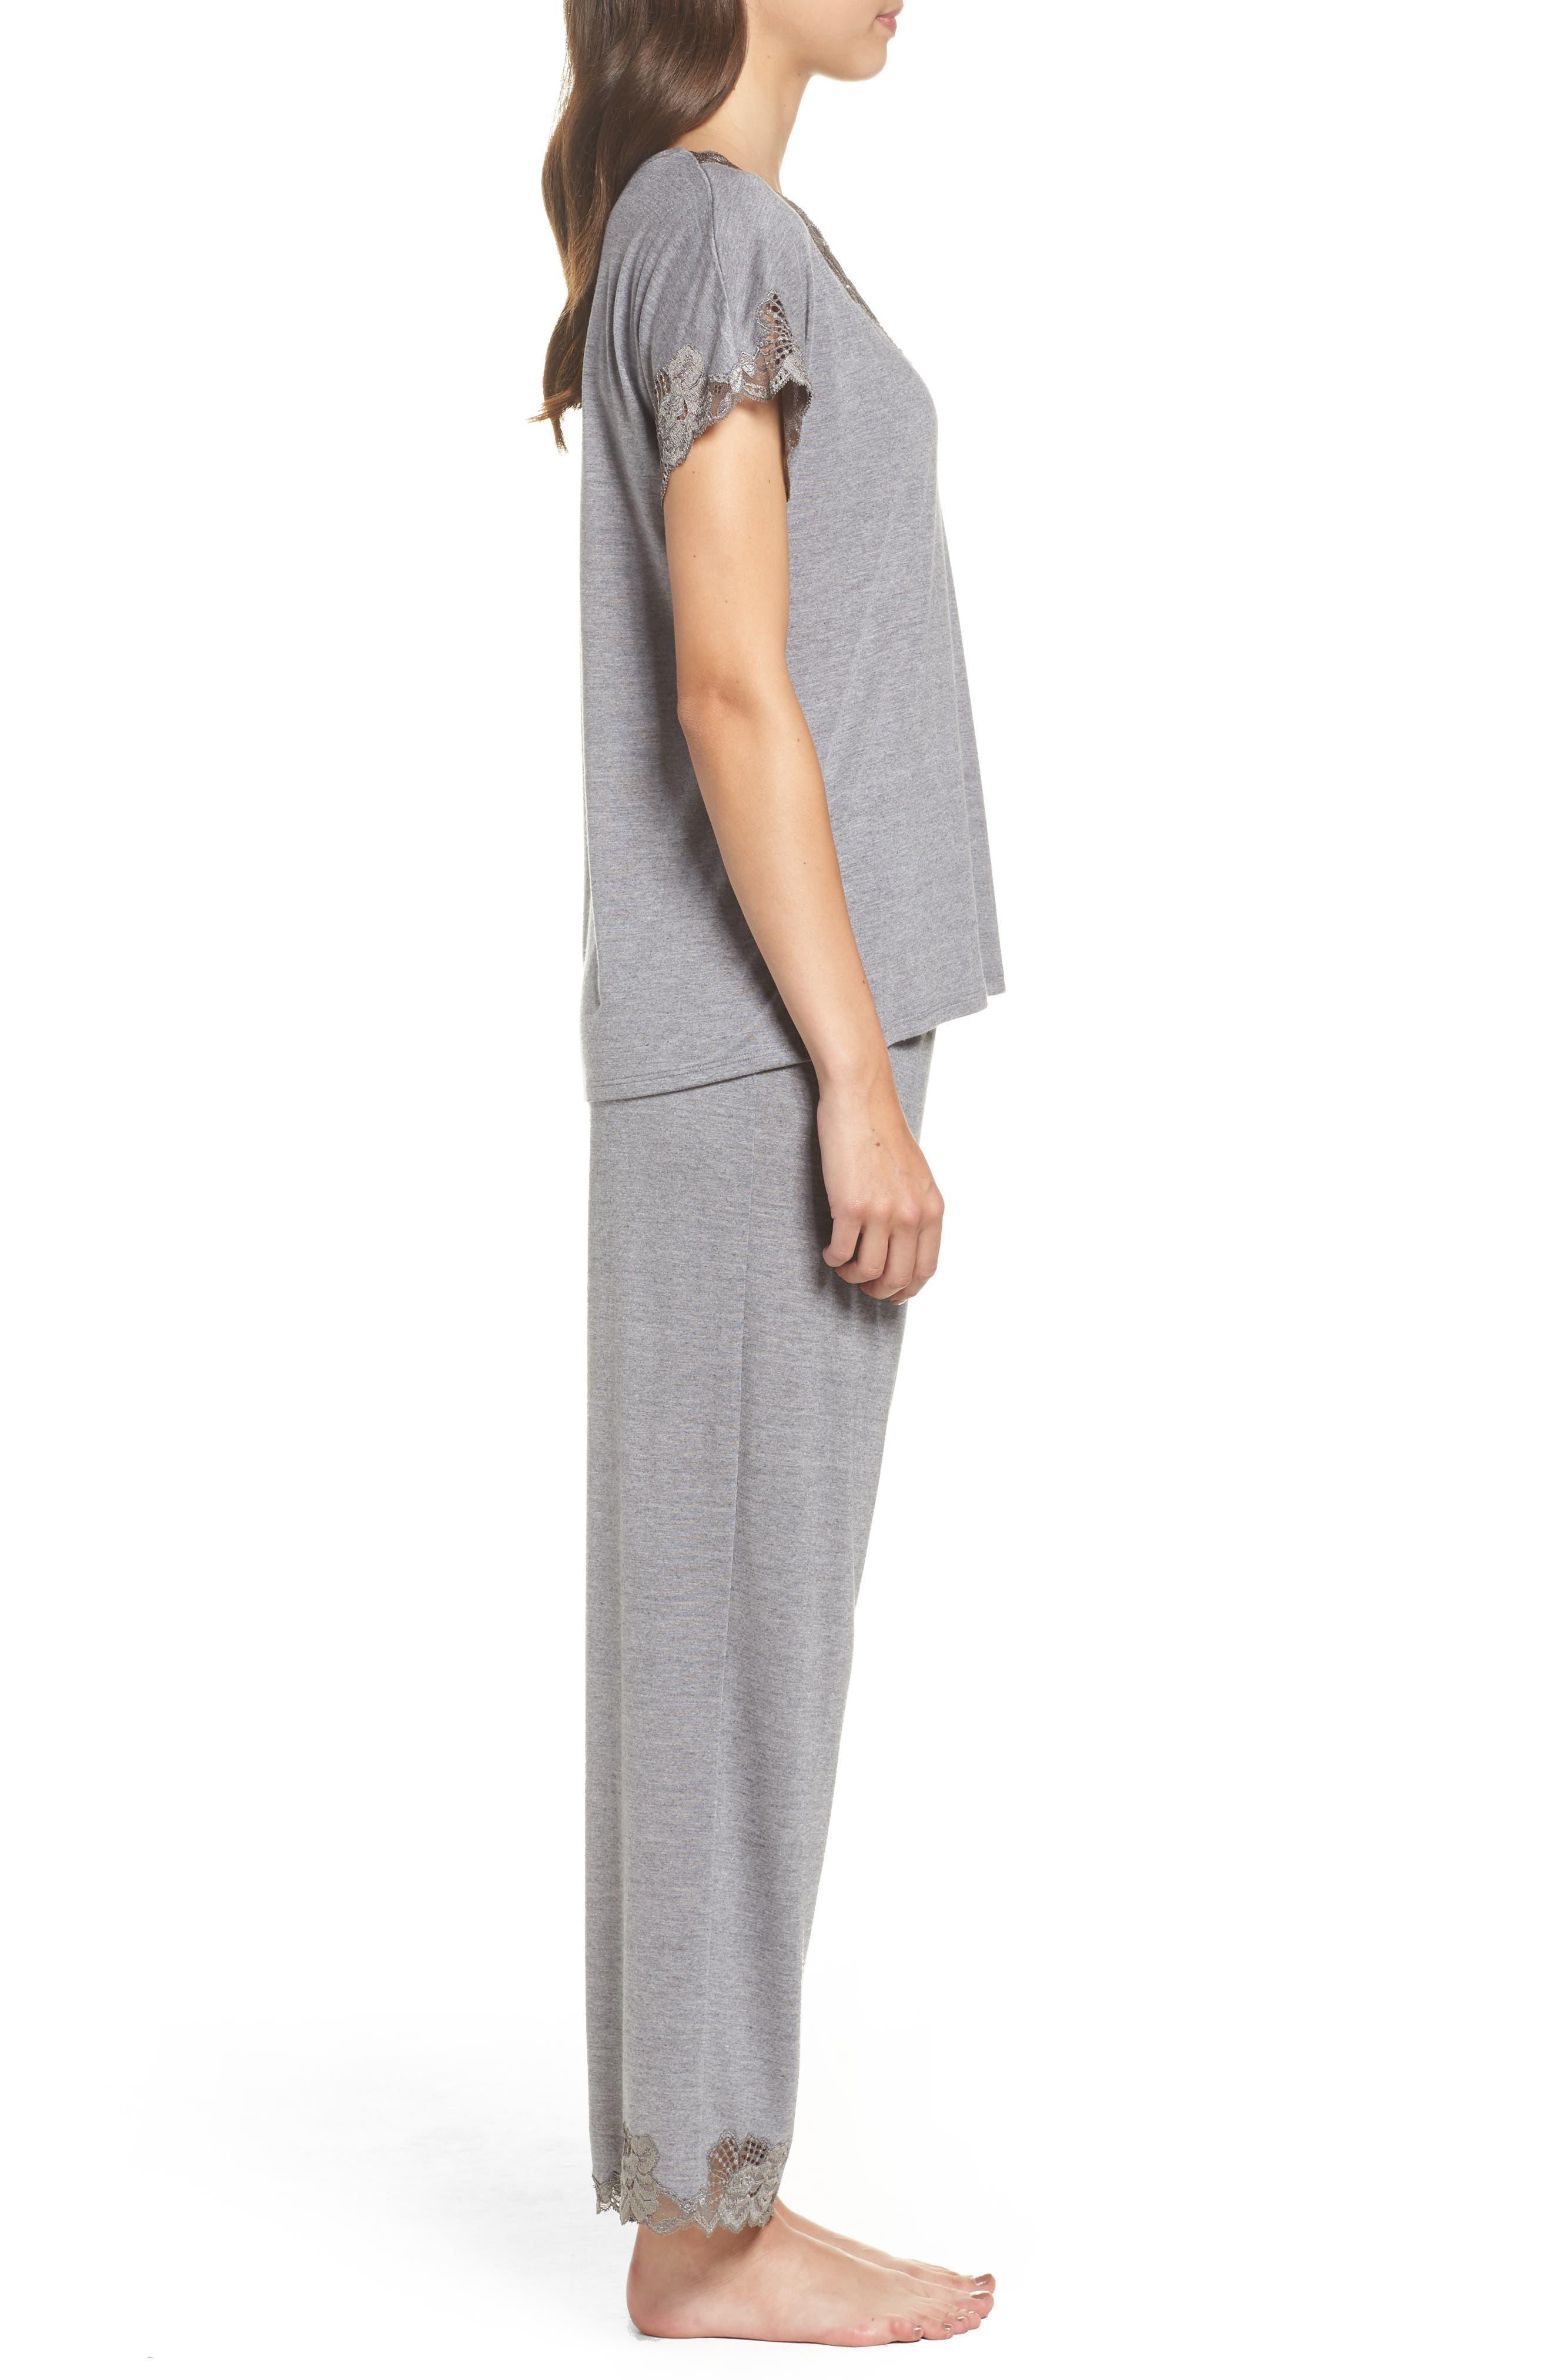 NATORI, 'Zen Floral' Pajama Set, Alternate thumbnail 3, color, 051